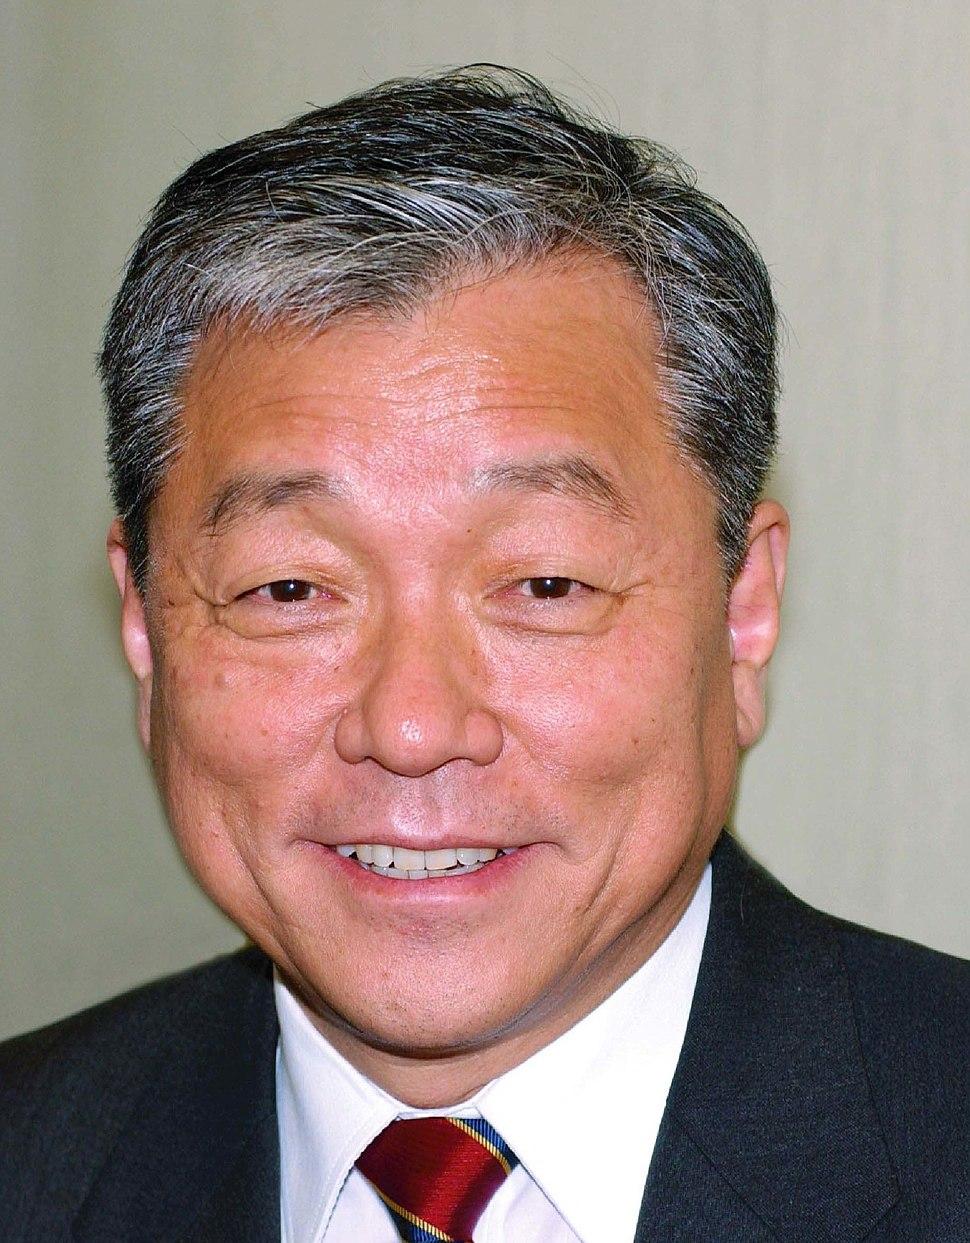 Dr Lee Jong-wook